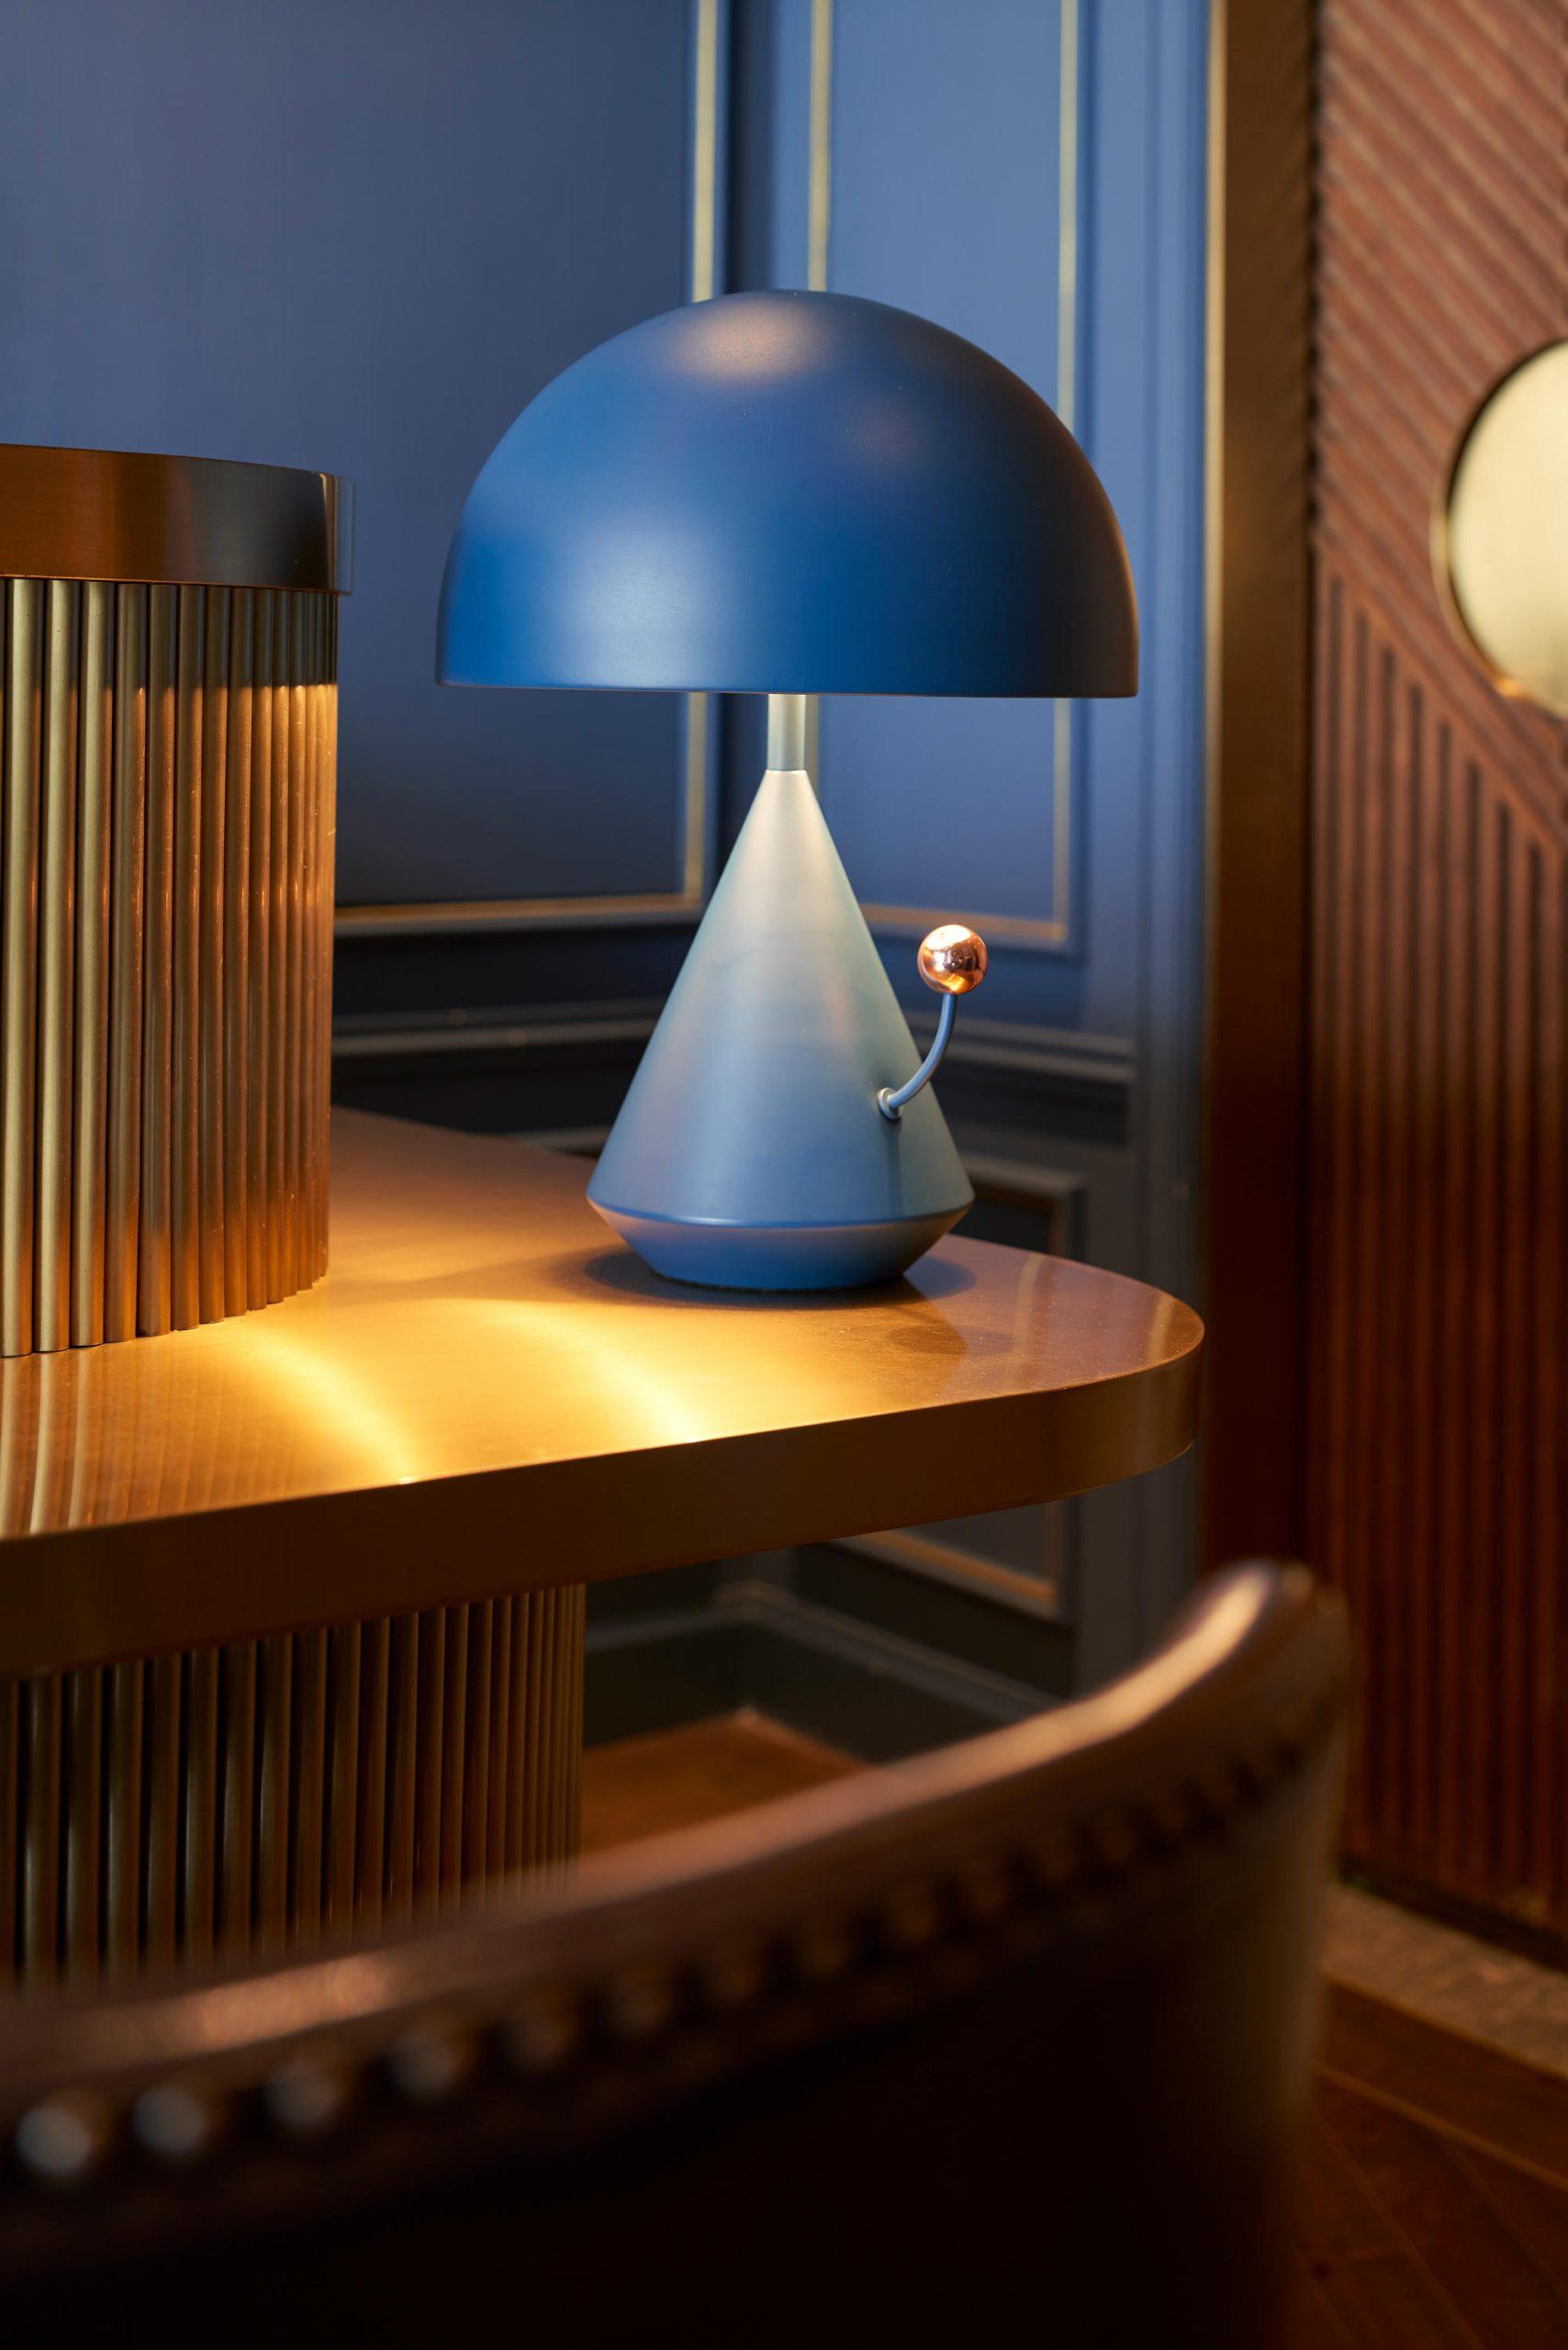 Dali Divina Lamp by Thomas Dariel for Maison Dada